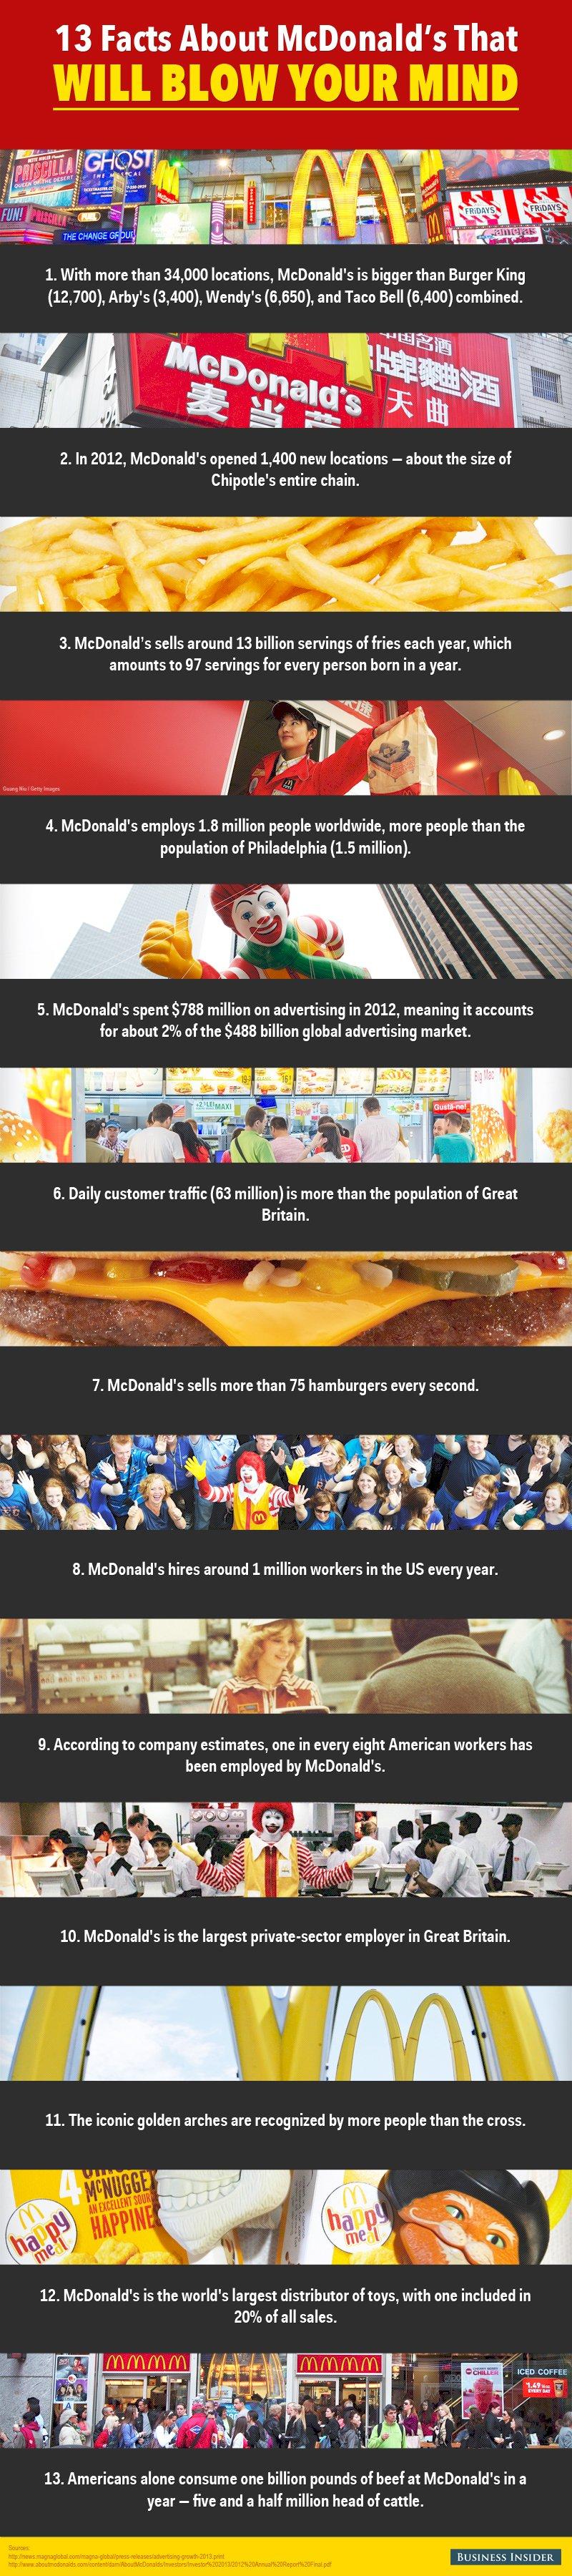 Facts-About-McDonalds